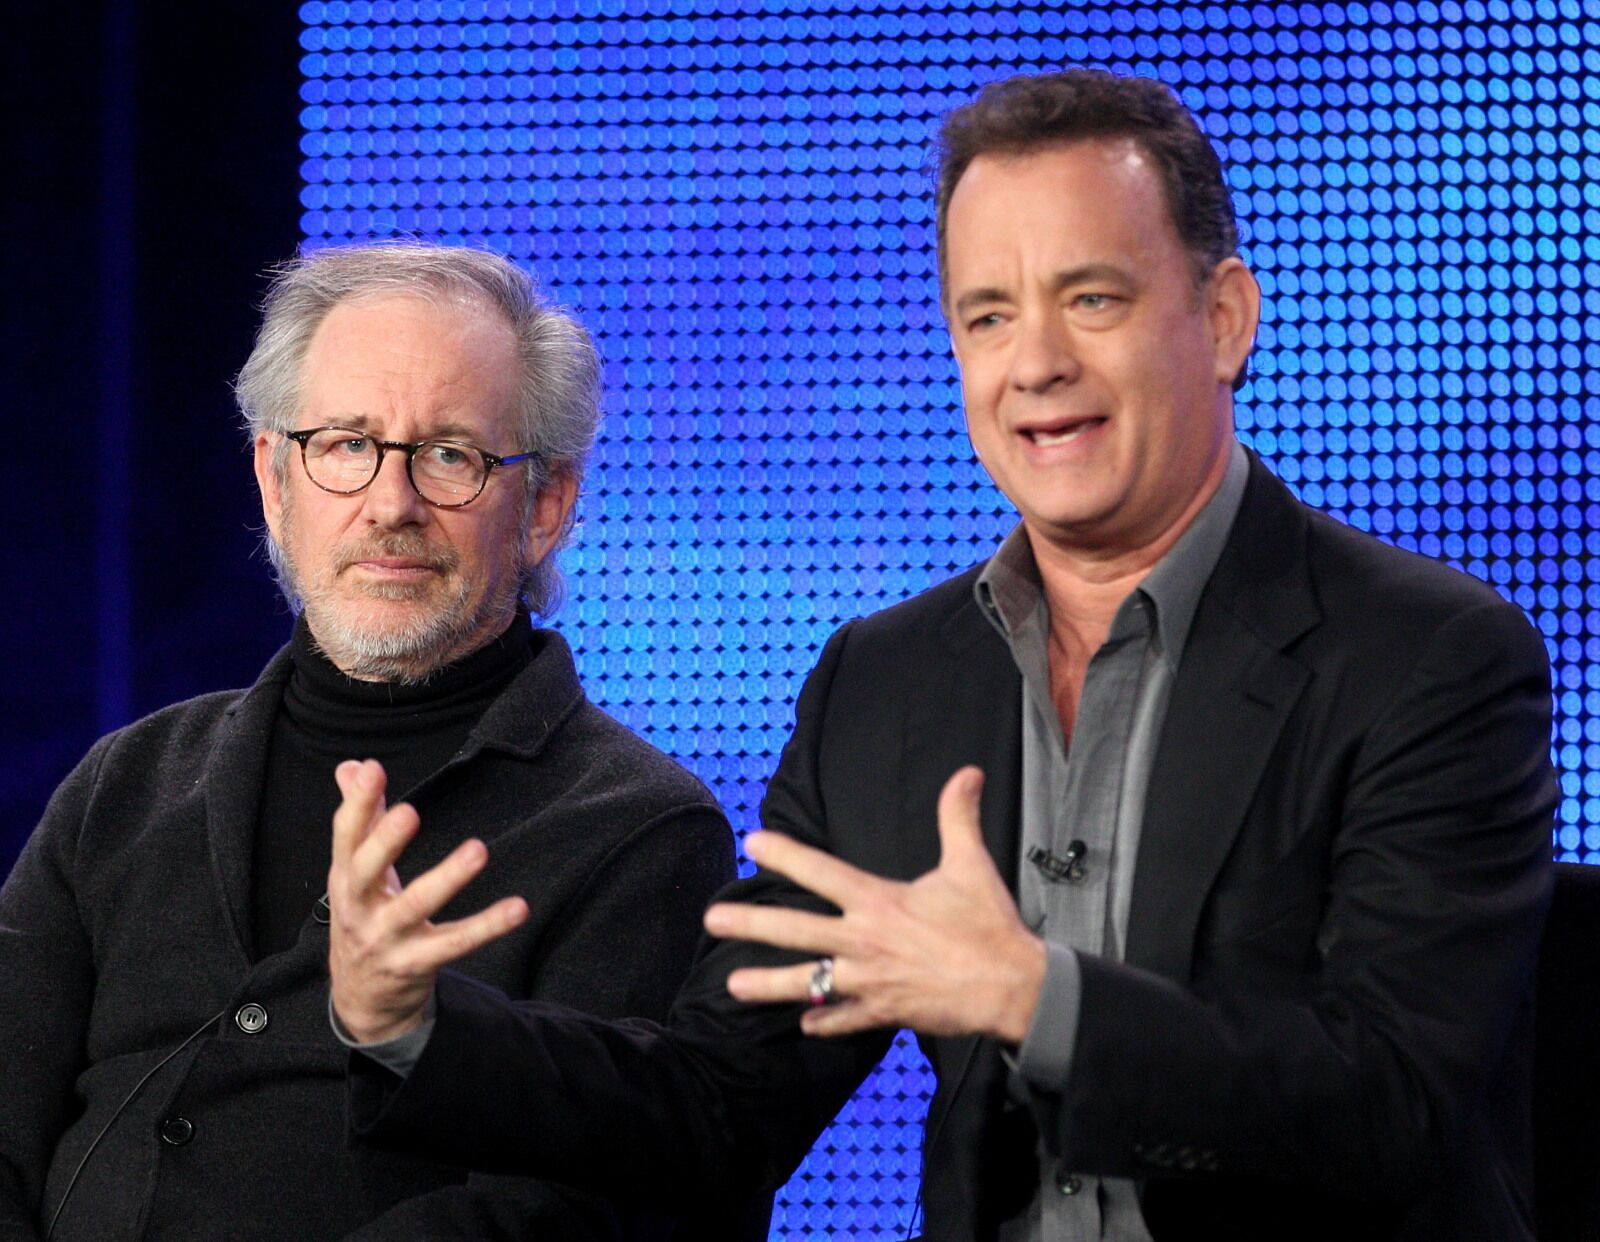 Steven Spielberg, Tom Hanks, Alfonso Cuarón, Stephen King all aboard Apple TV+